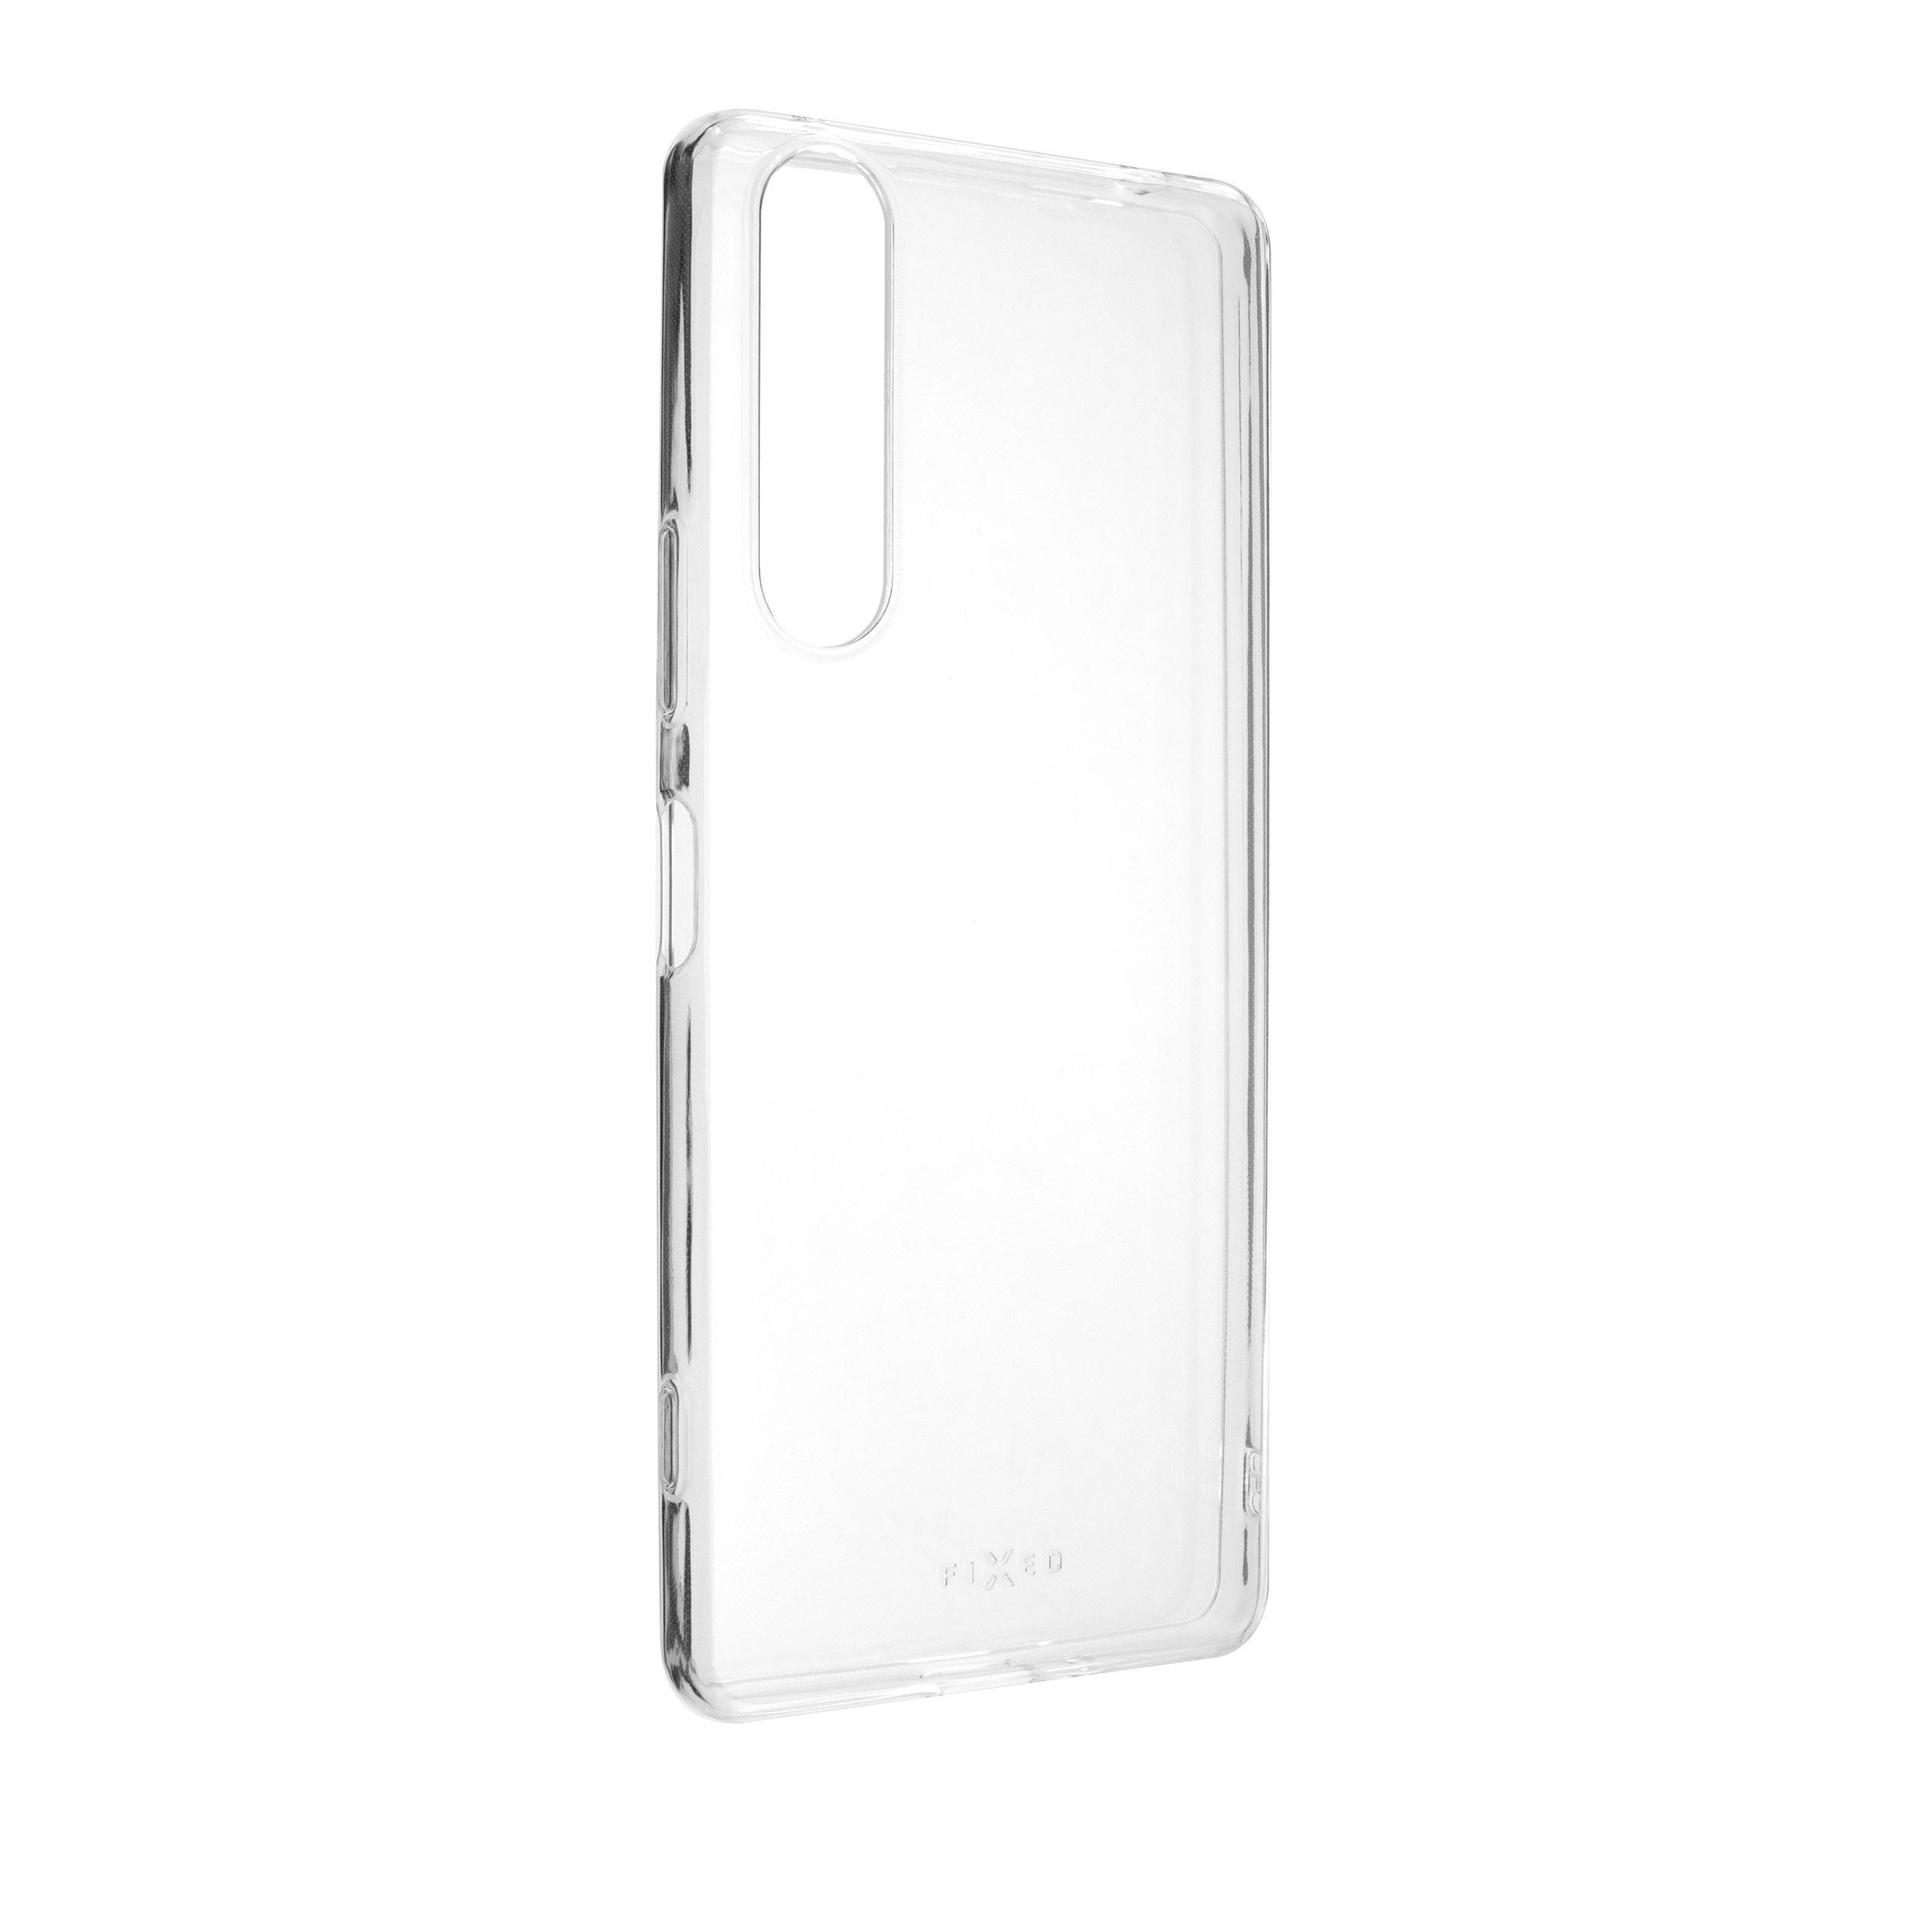 Ultratenké TPU gelové pouzdro FIXED Skin pro Sony Xperia 1 II, 0,6 mm, čiré